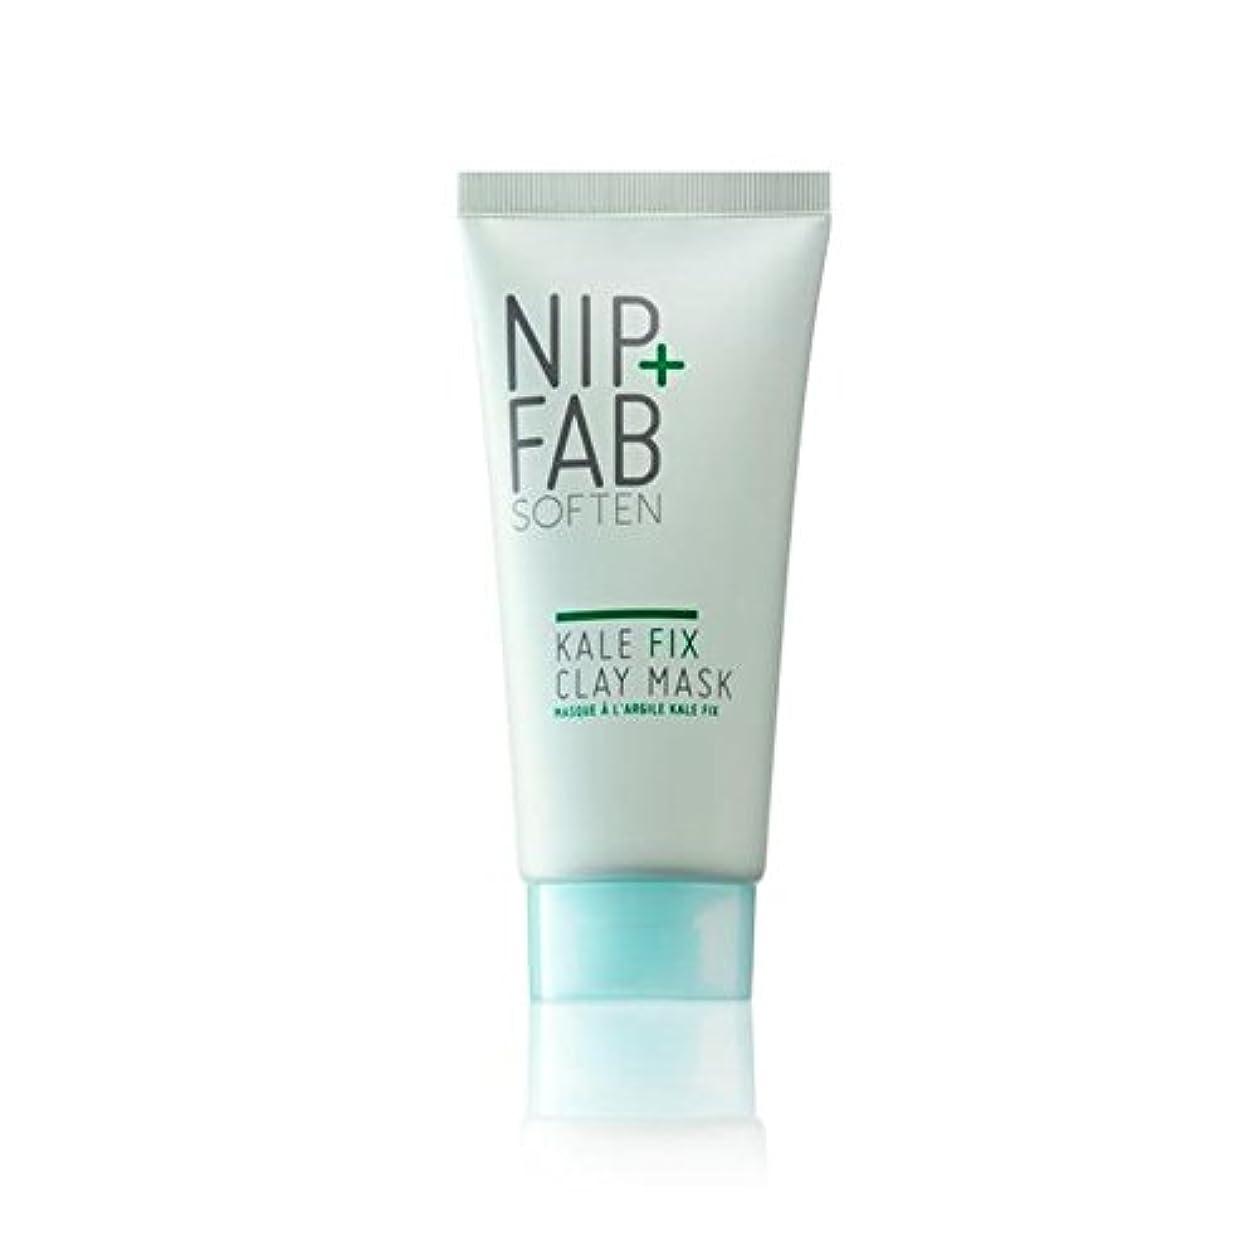 Nip+Fab Kale Fix Clay Mask 50ml - + ケール修正クレイマスク50ミリリットルニップ [並行輸入品]